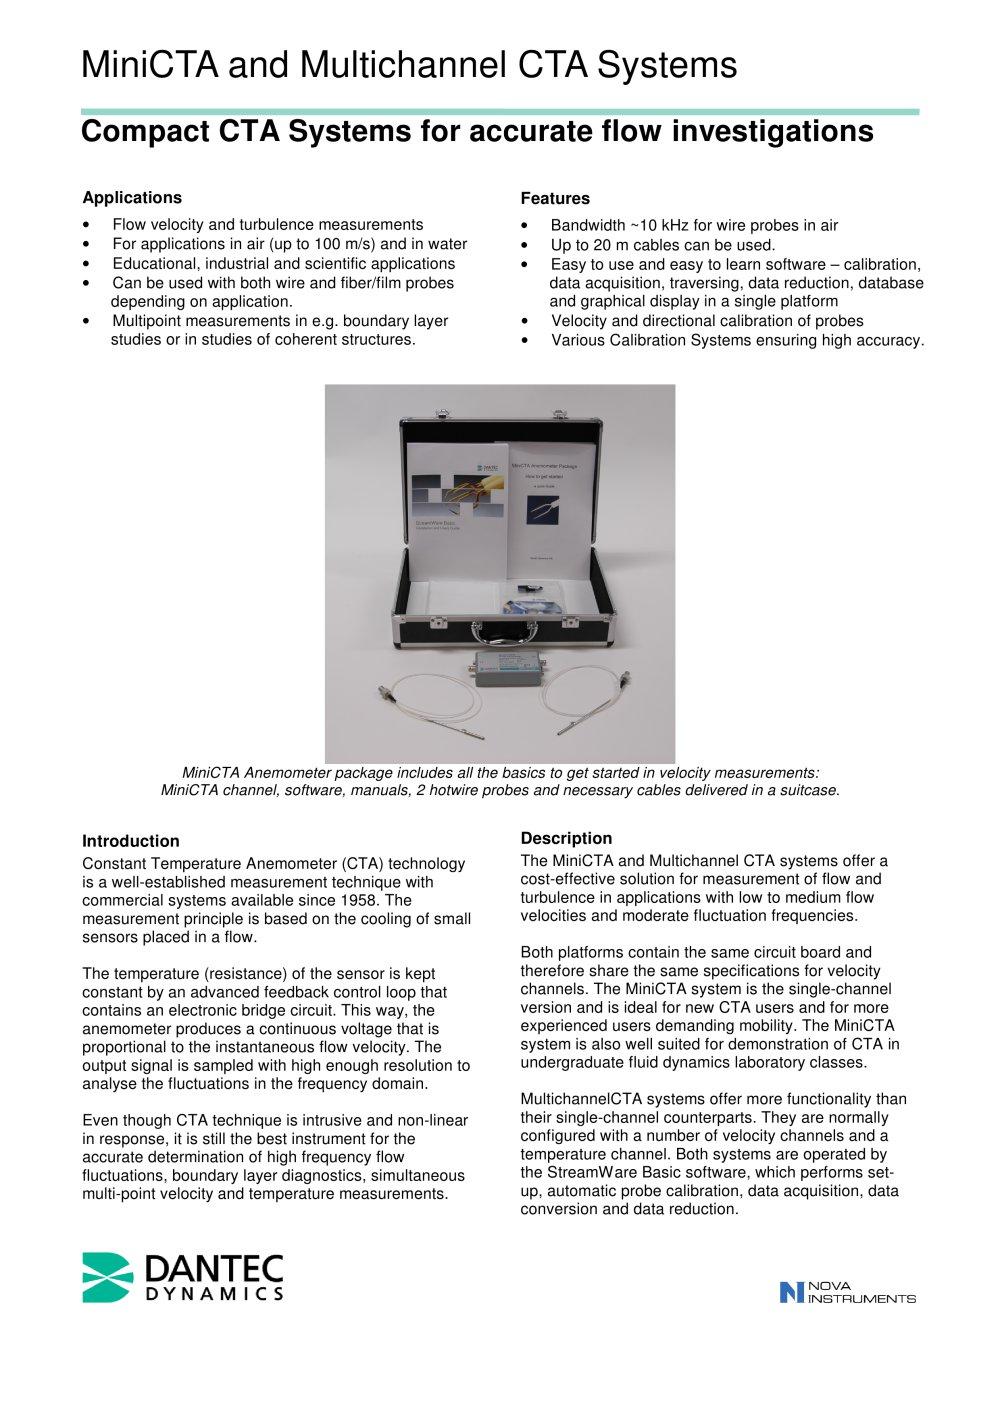 MiniCTA / Multichannel CTA Anemometer System - Dantec Dynamics A/S ...